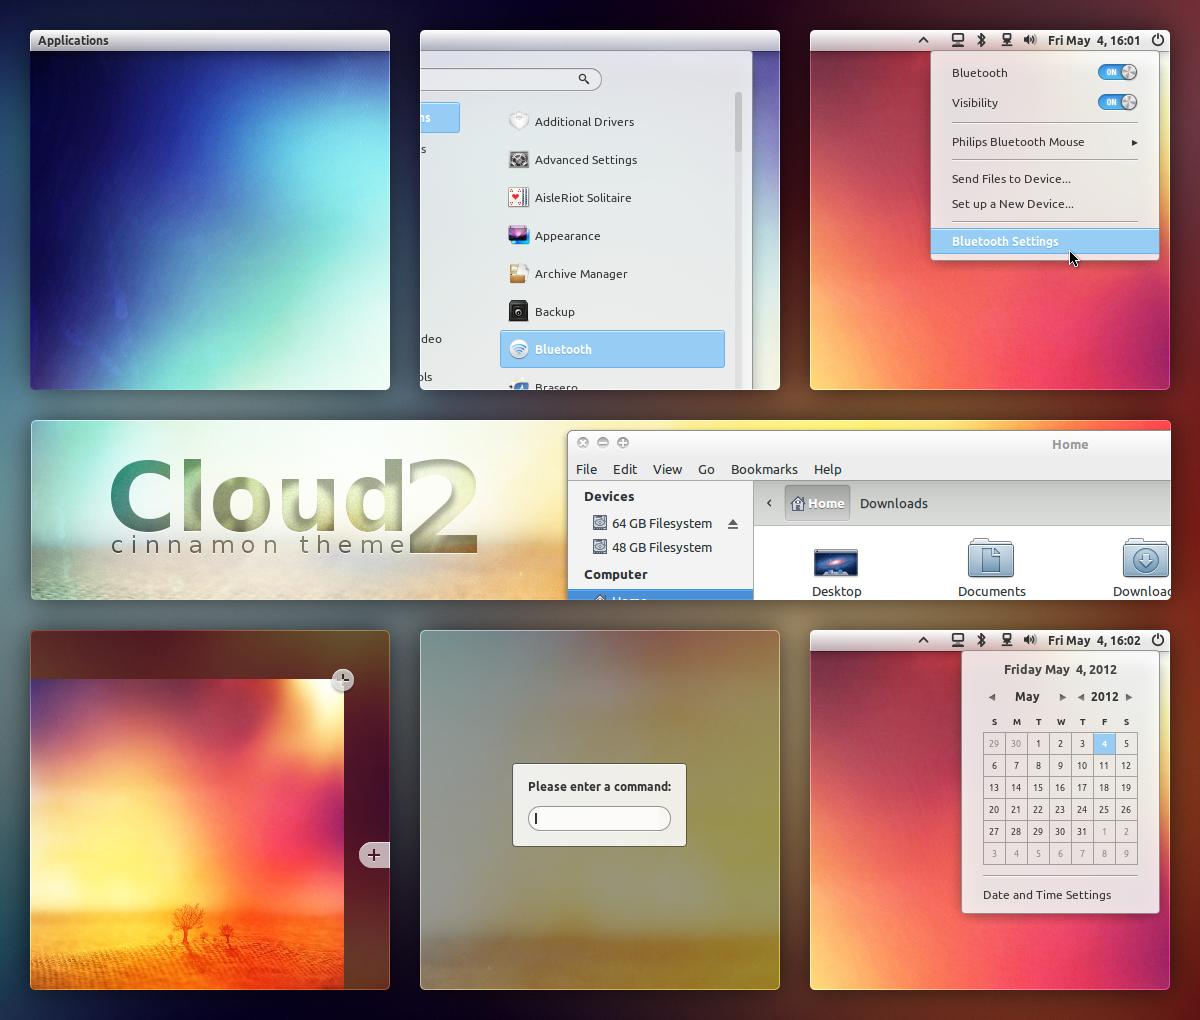 Cloud 2 - Cinnamon Theme by DzaDze